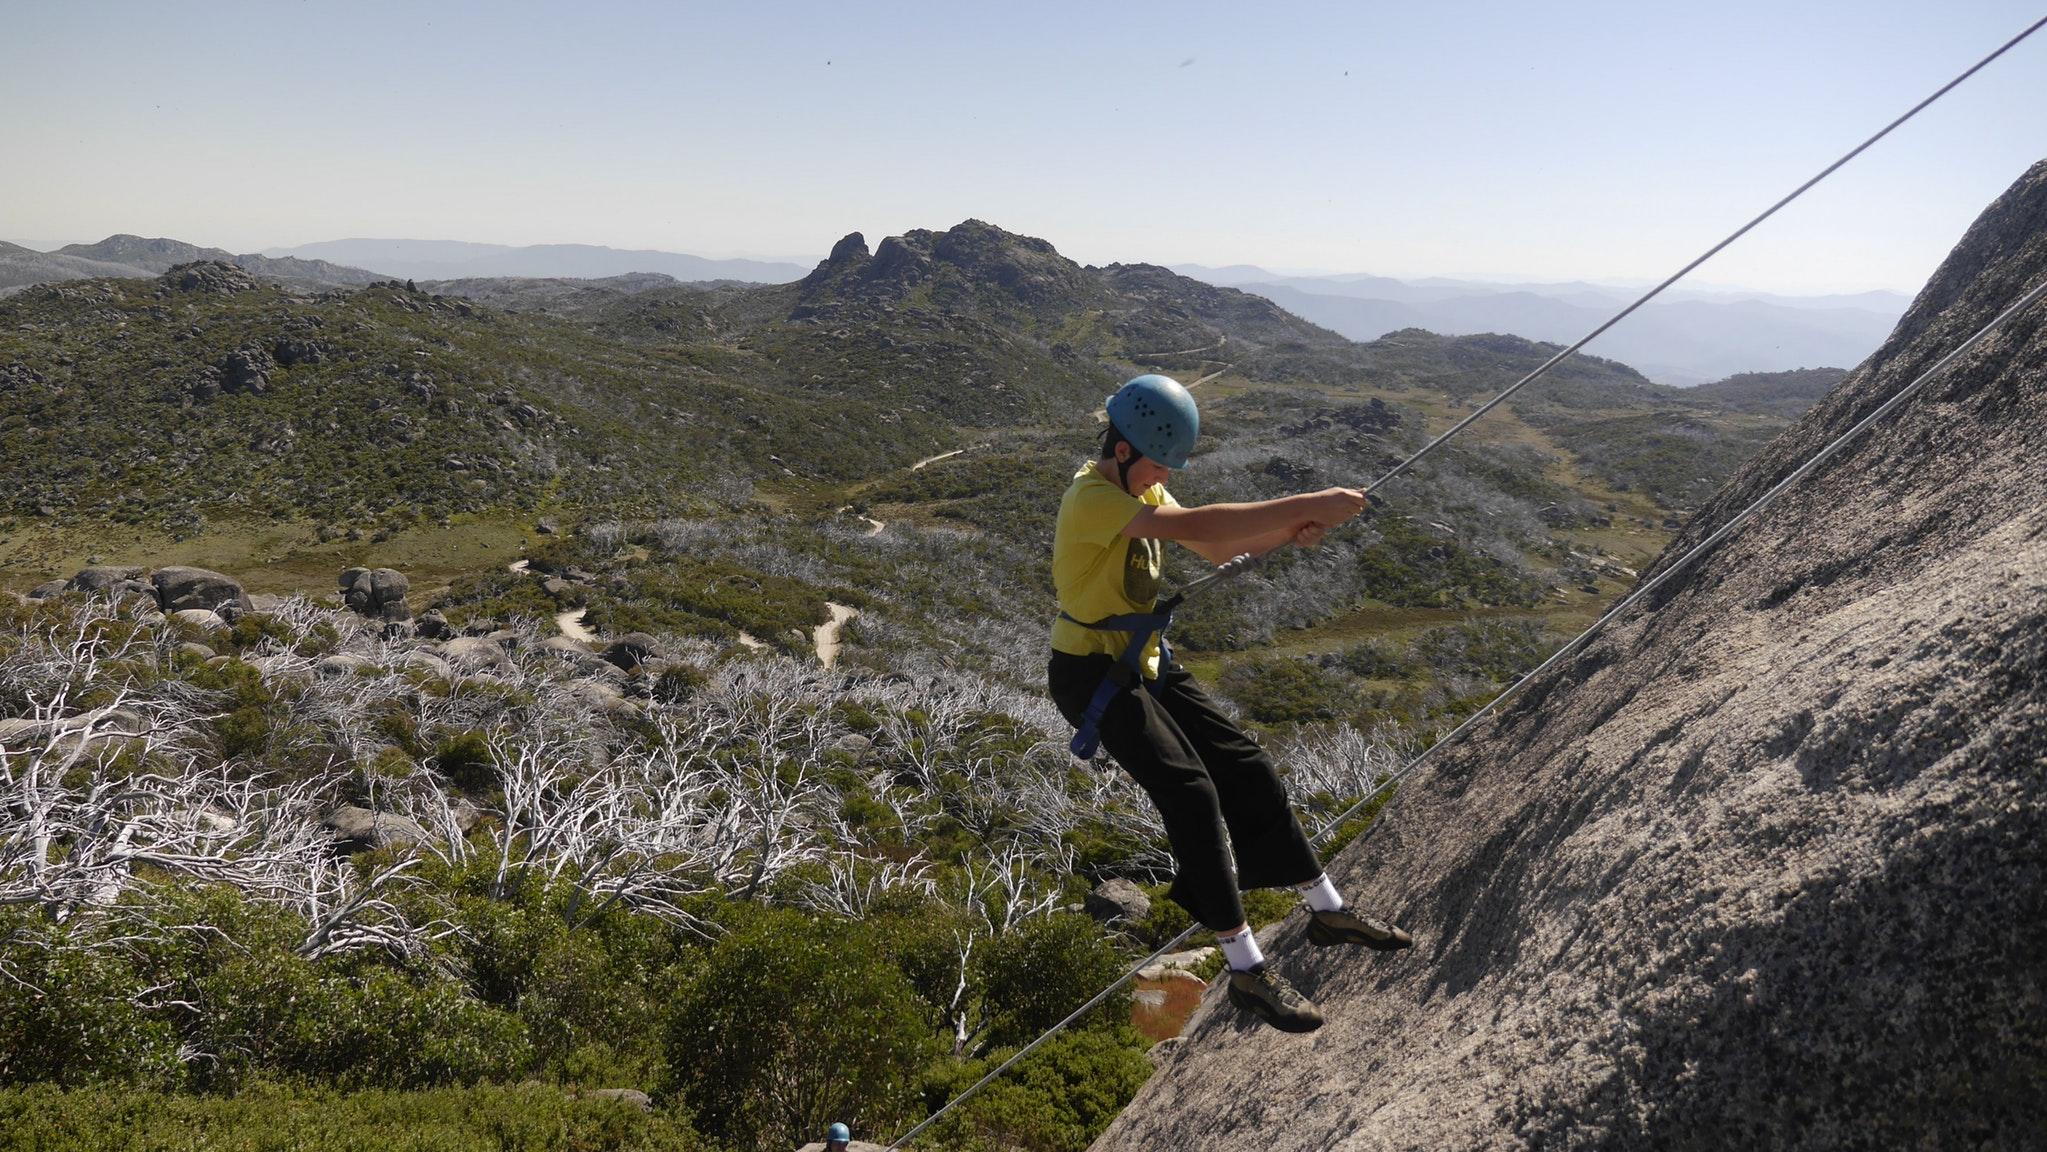 Mt Buffalo Rock Climbing